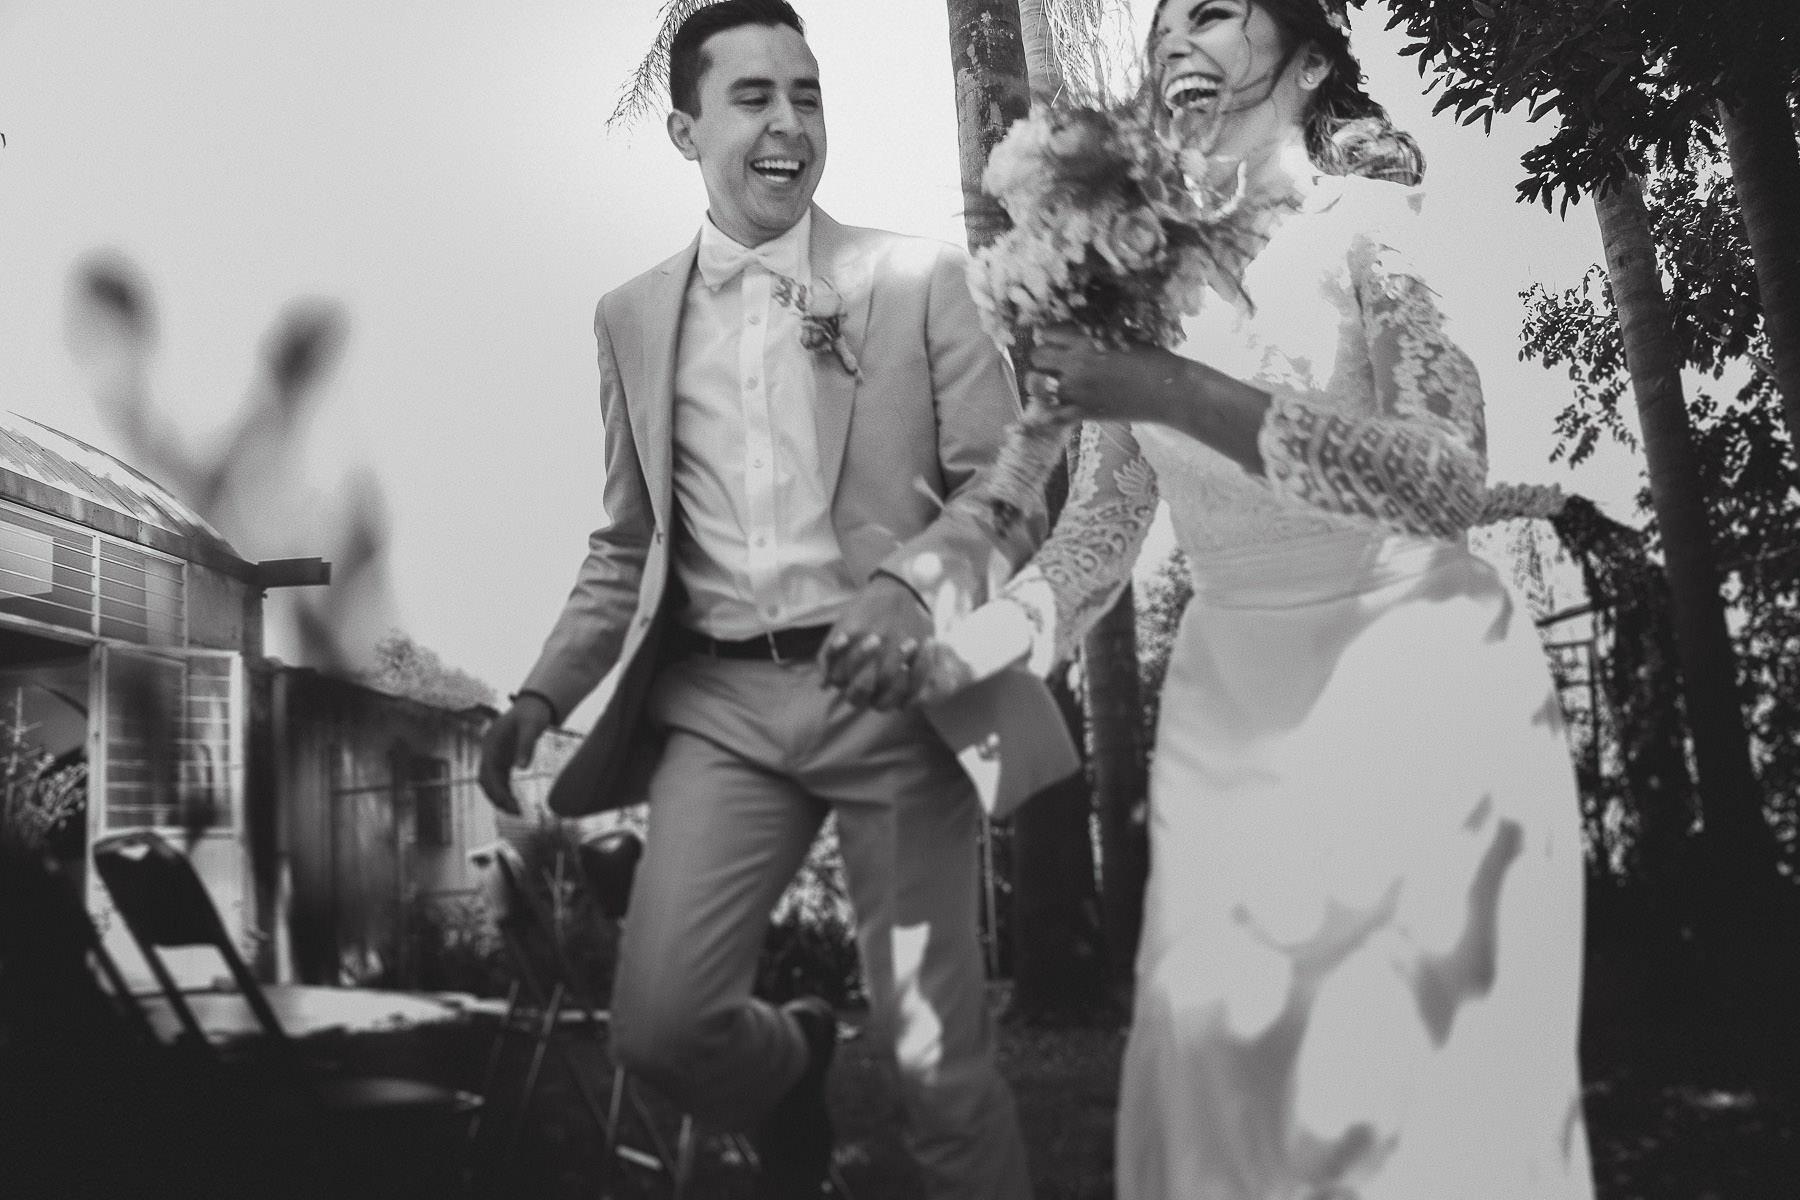 fine art,vestidos de novia,bodas en talixco,bodas en haciendas,haciendas para boda en atlixco,real wedding,